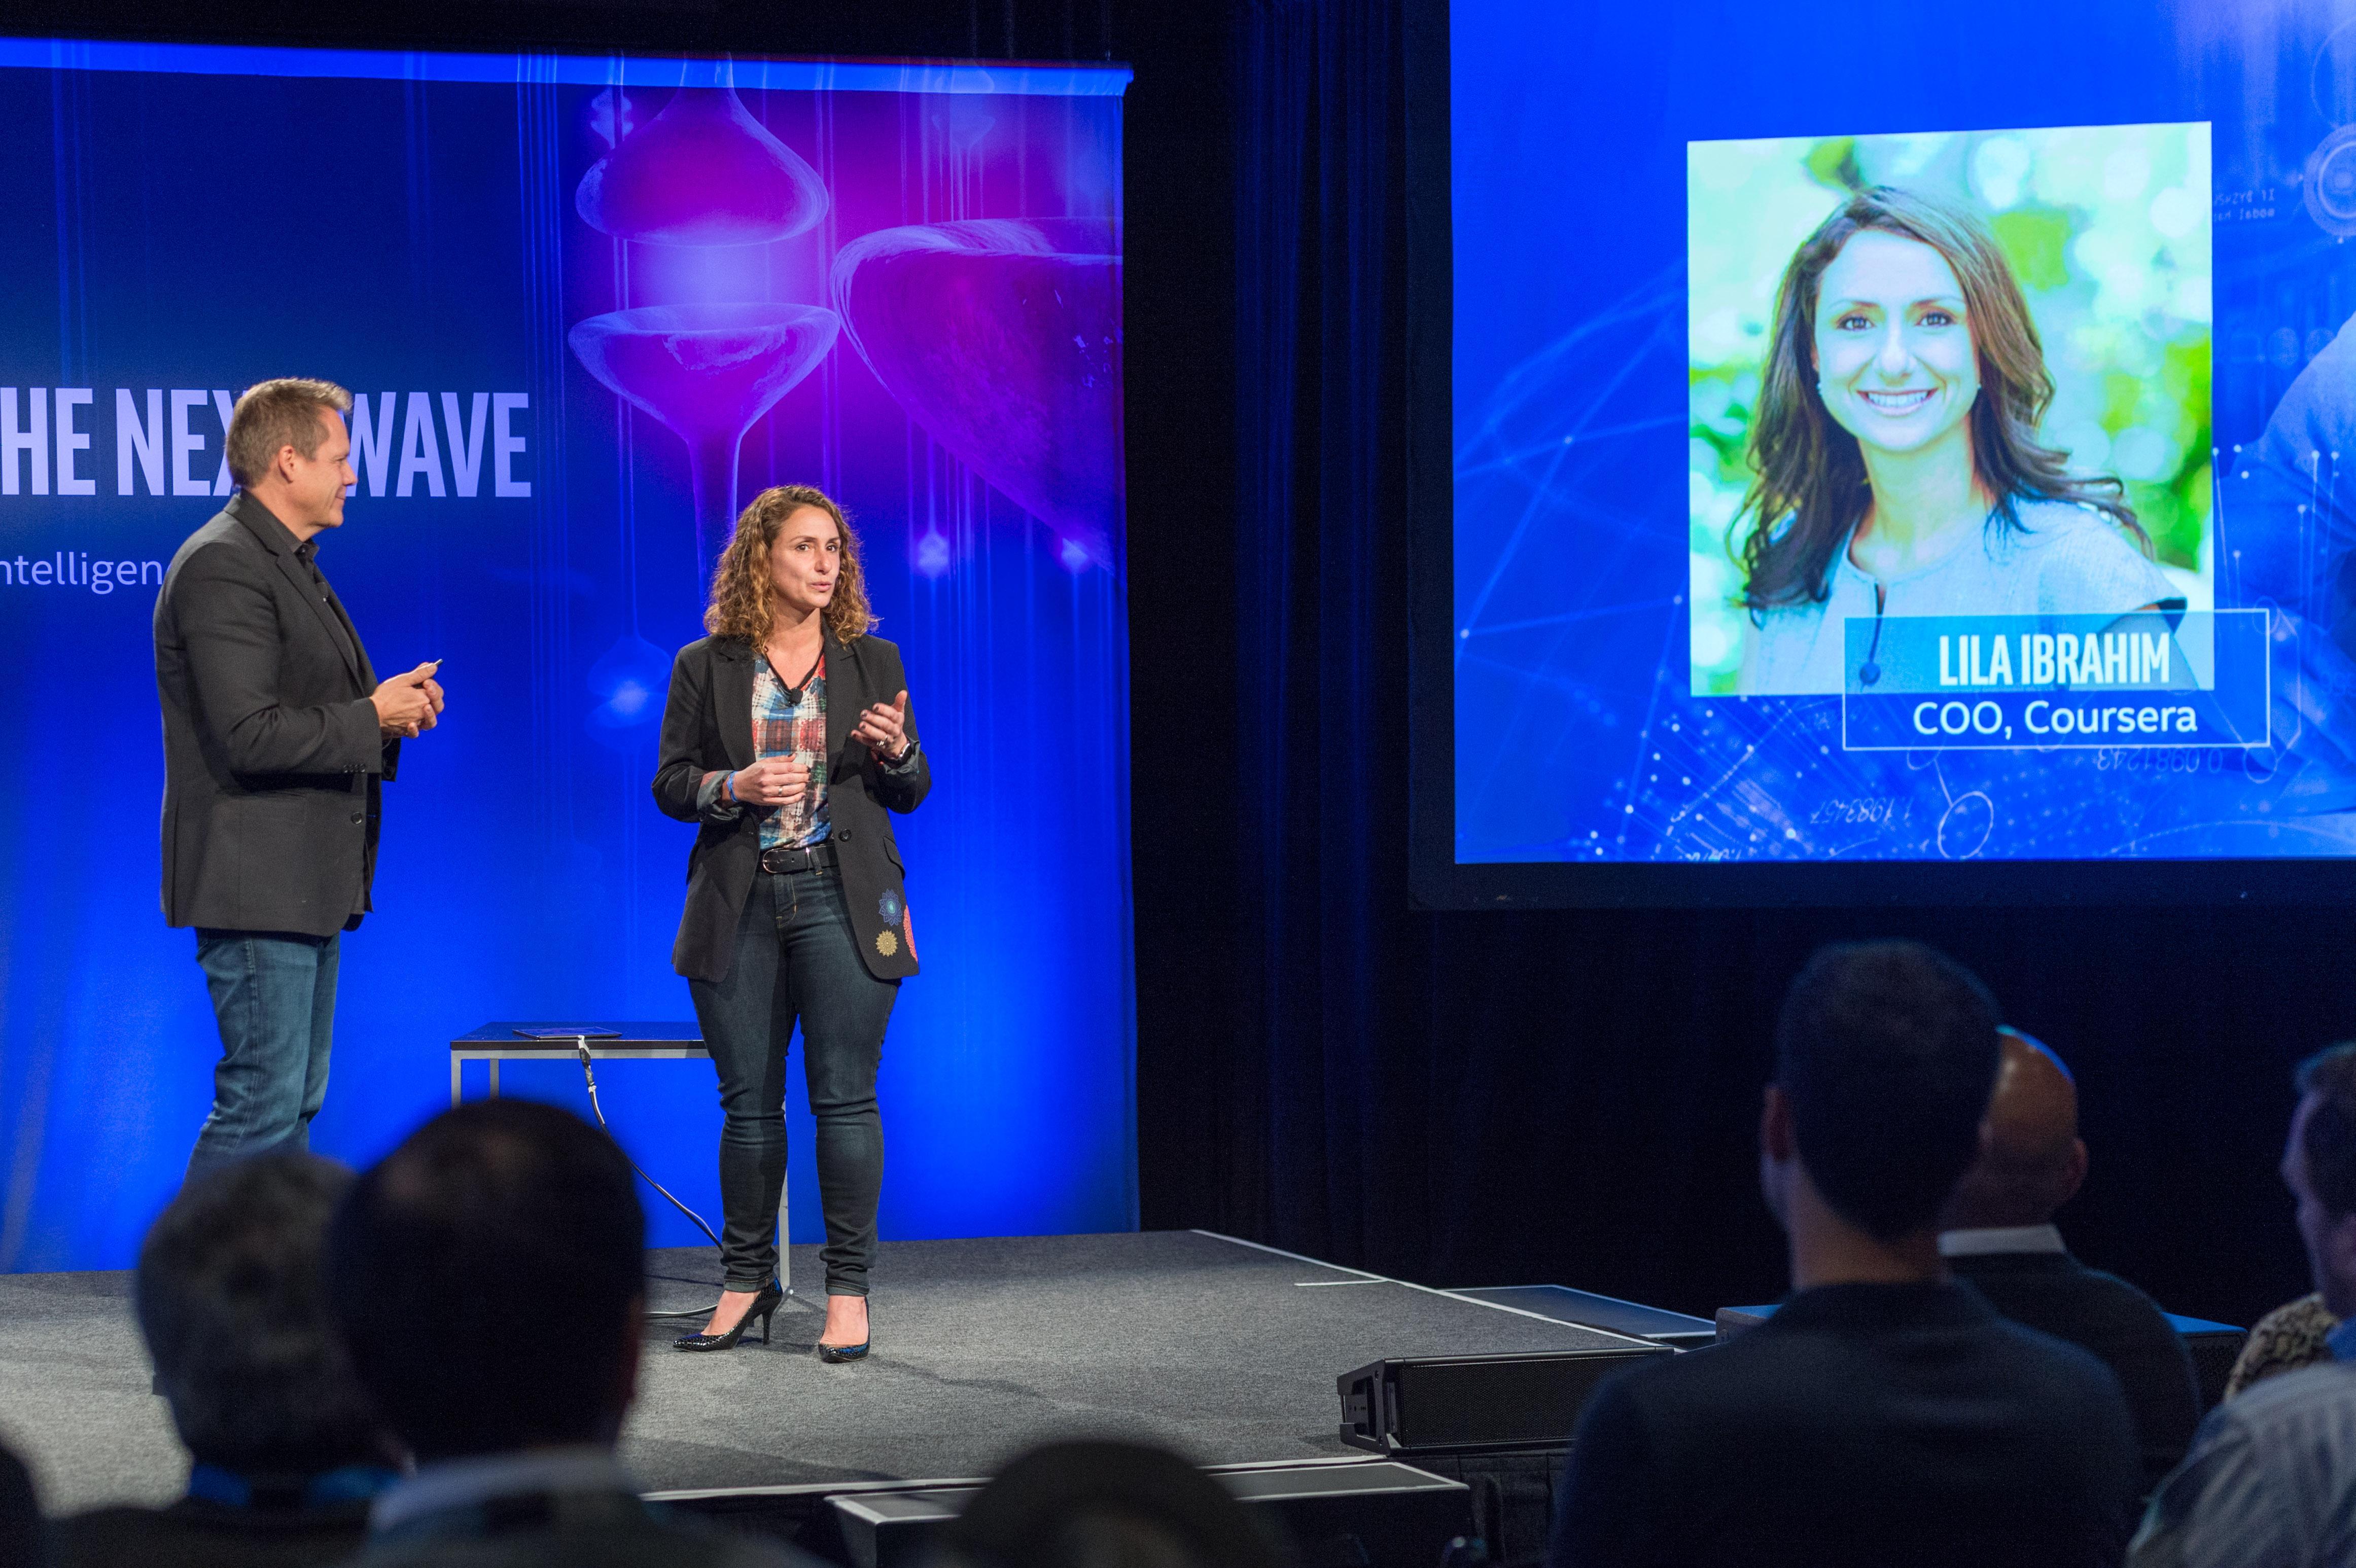 Intel's Doug Fisher (left) and Coursera COO Lila Ibrahim (right)